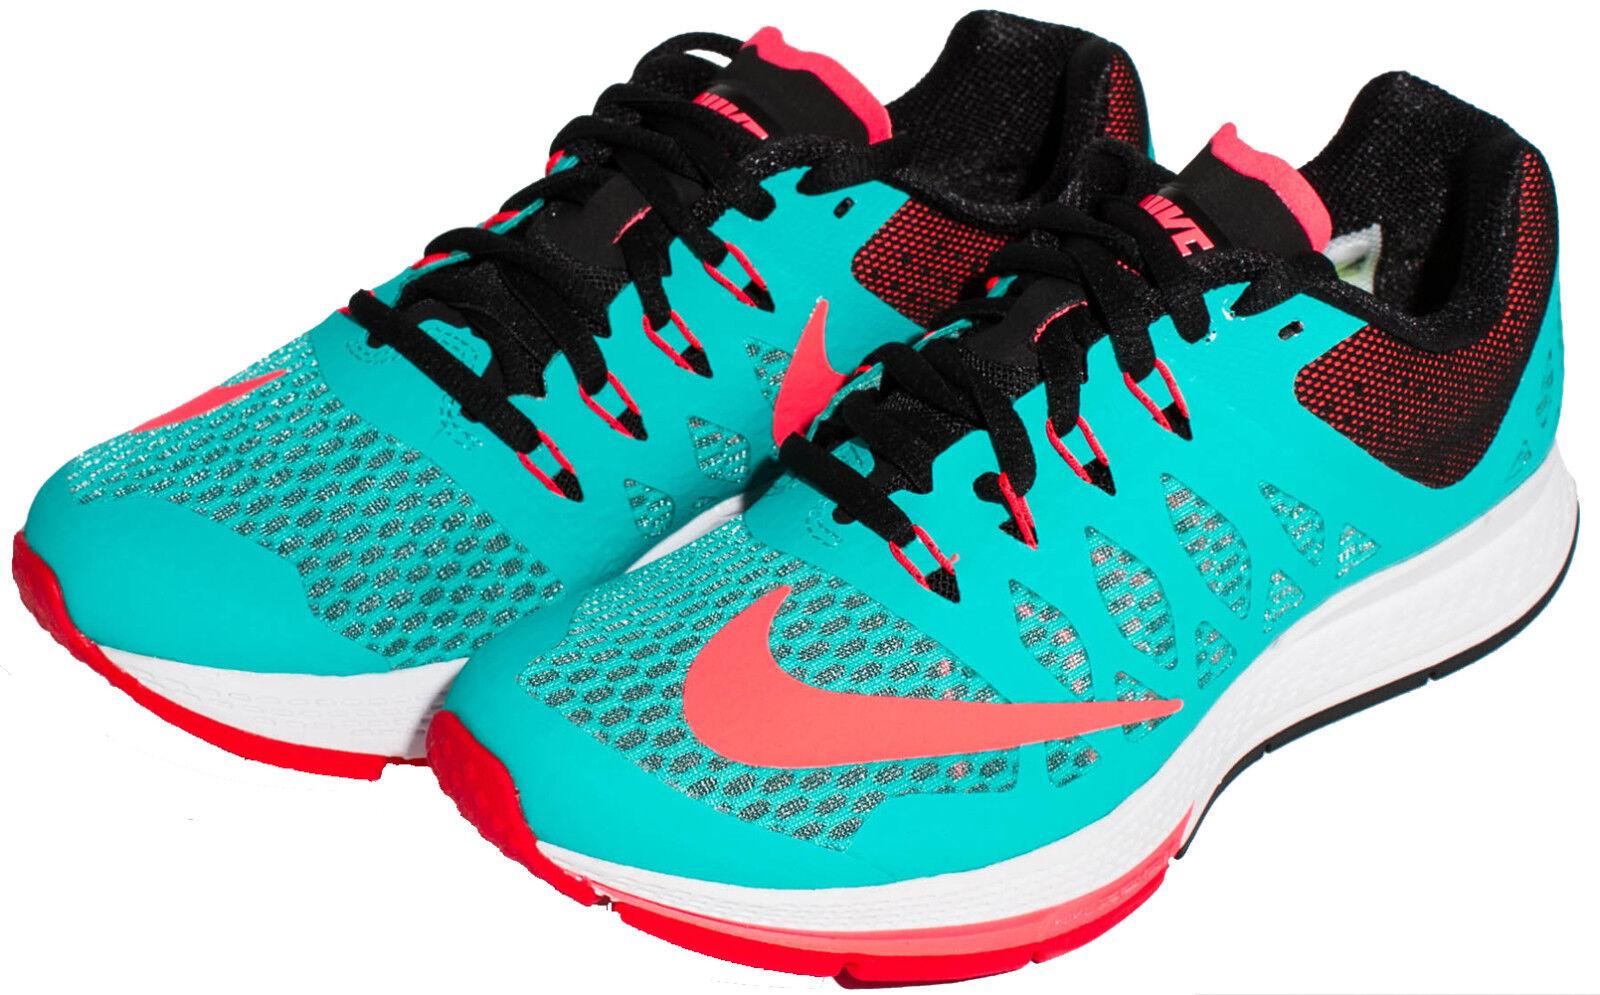 Nike Damen Luft Zoom Elite 7 Laufschuhe hyper jade / Punch 654444-300 SZ 5-8.5